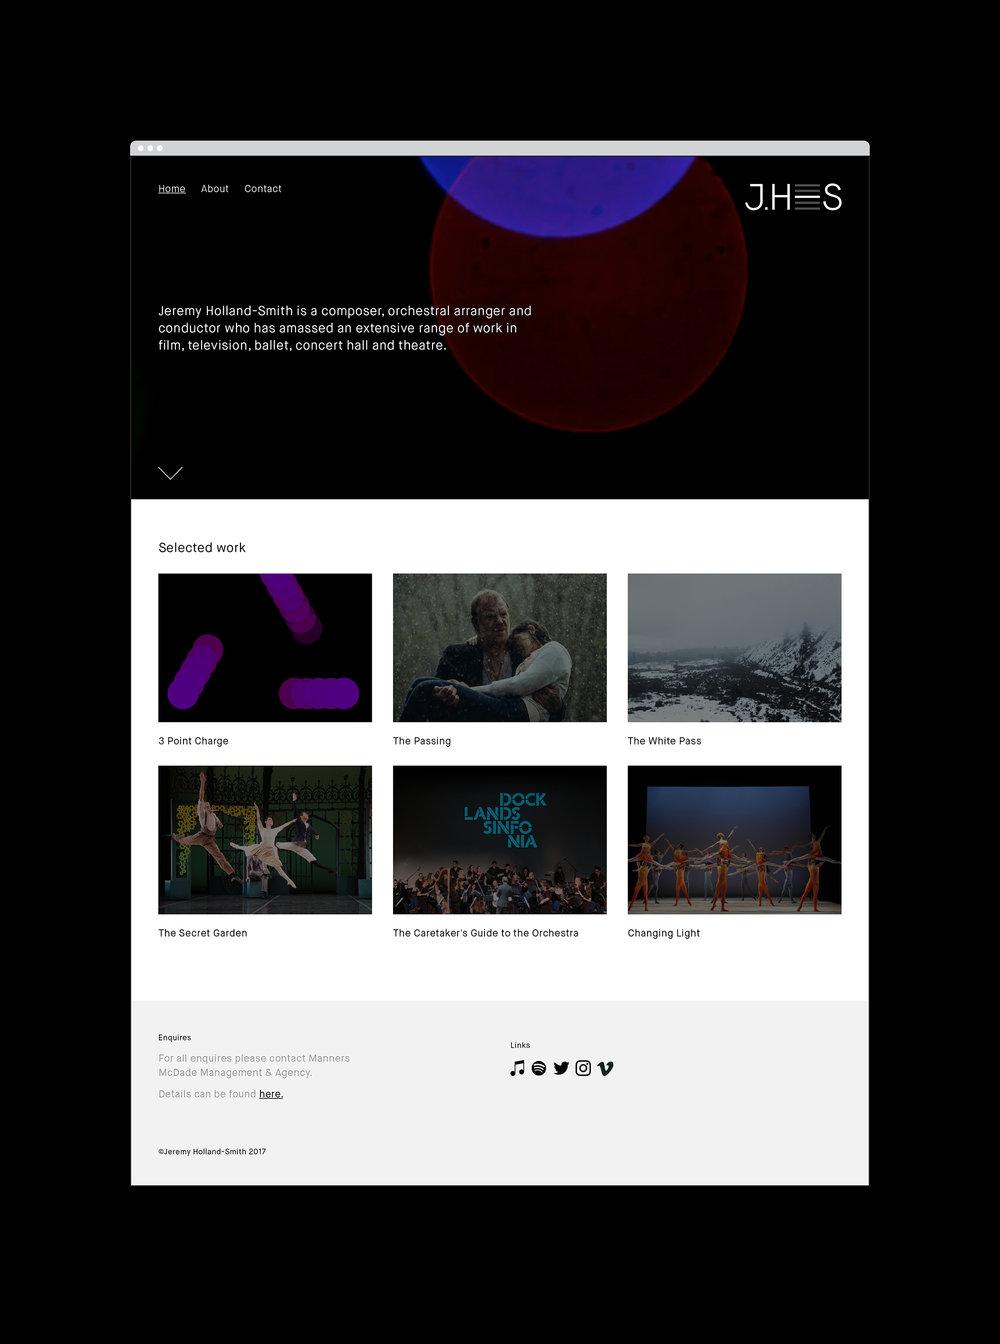 NicholasSmart_Jeremy-Holland-Smith_Musician_Identity_Digital_Website_01.jpg